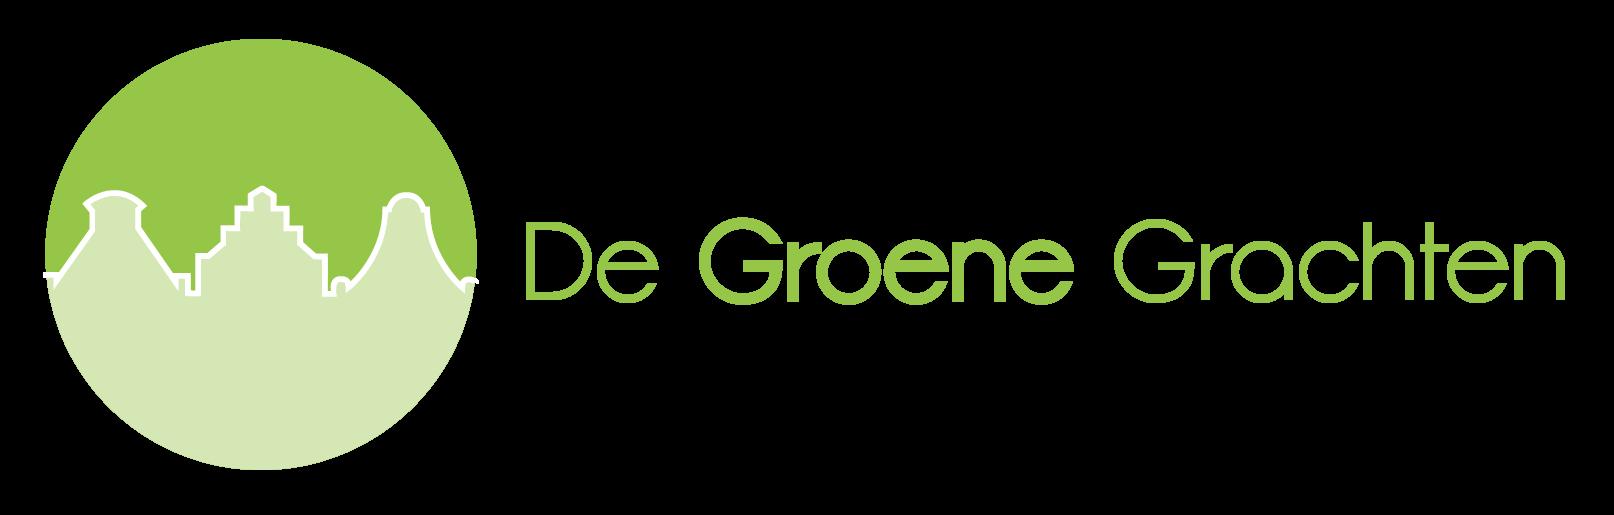 De Groene Grachten